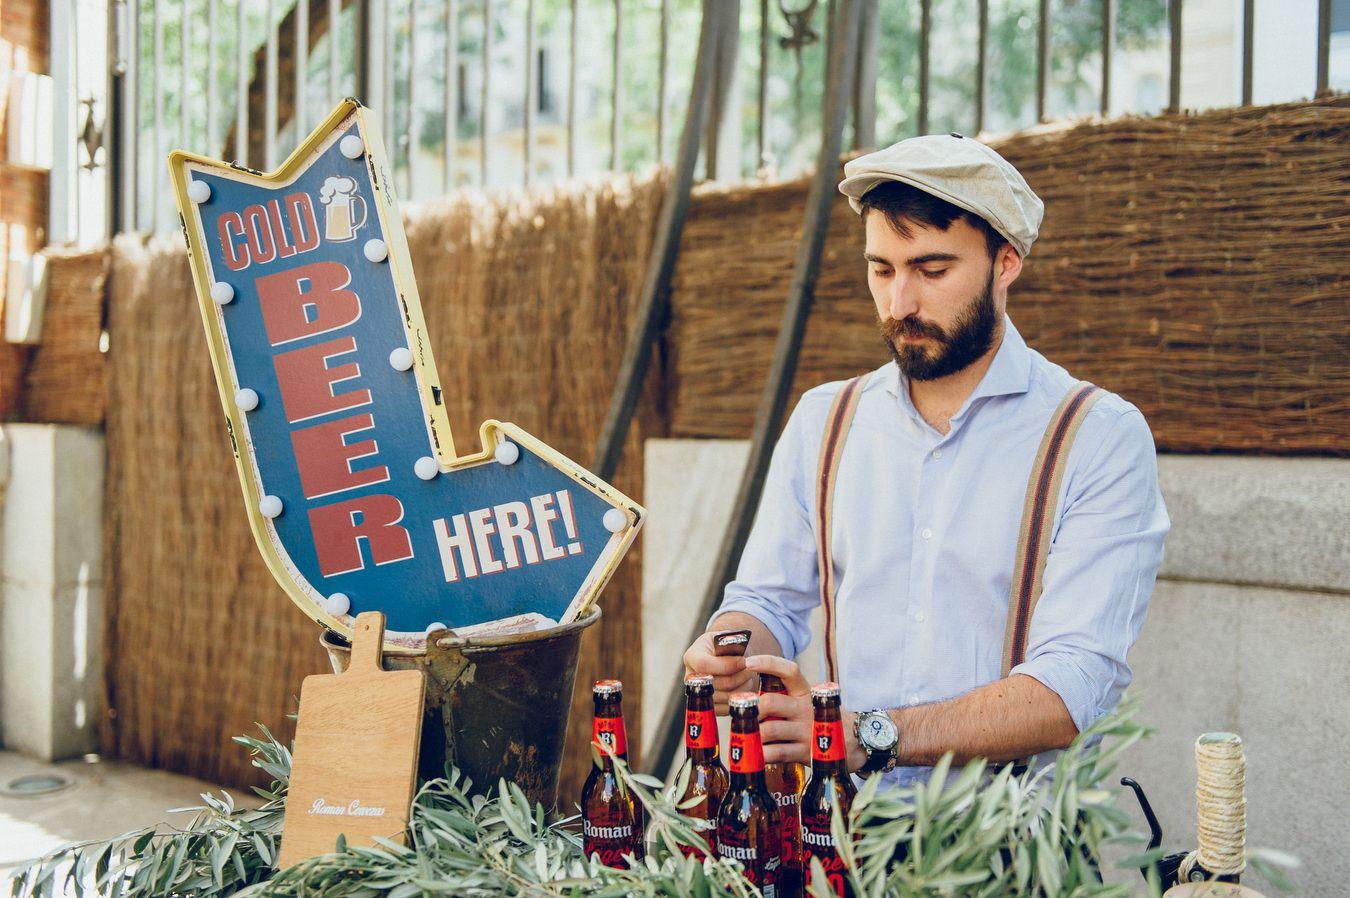 calista-one-lista-de-bodas-online-blog-de-bodas-calista-one-summer-party-2016-roman-cervezas-9